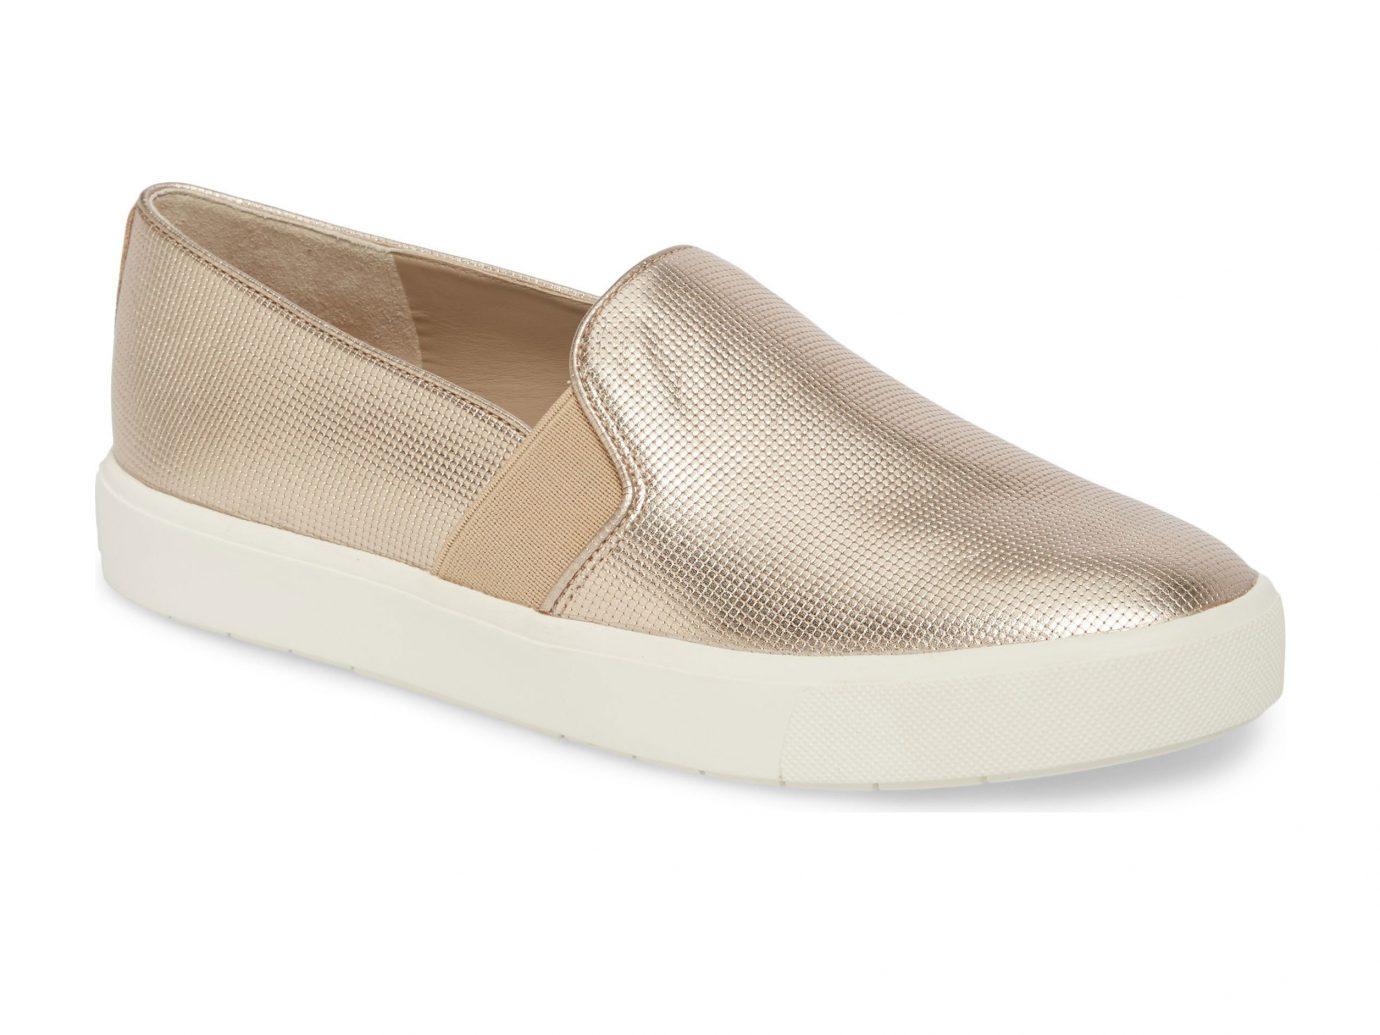 Style + Design Travel Shop footwear shoe product khaki beige walking shoe outdoor shoe product design sneakers